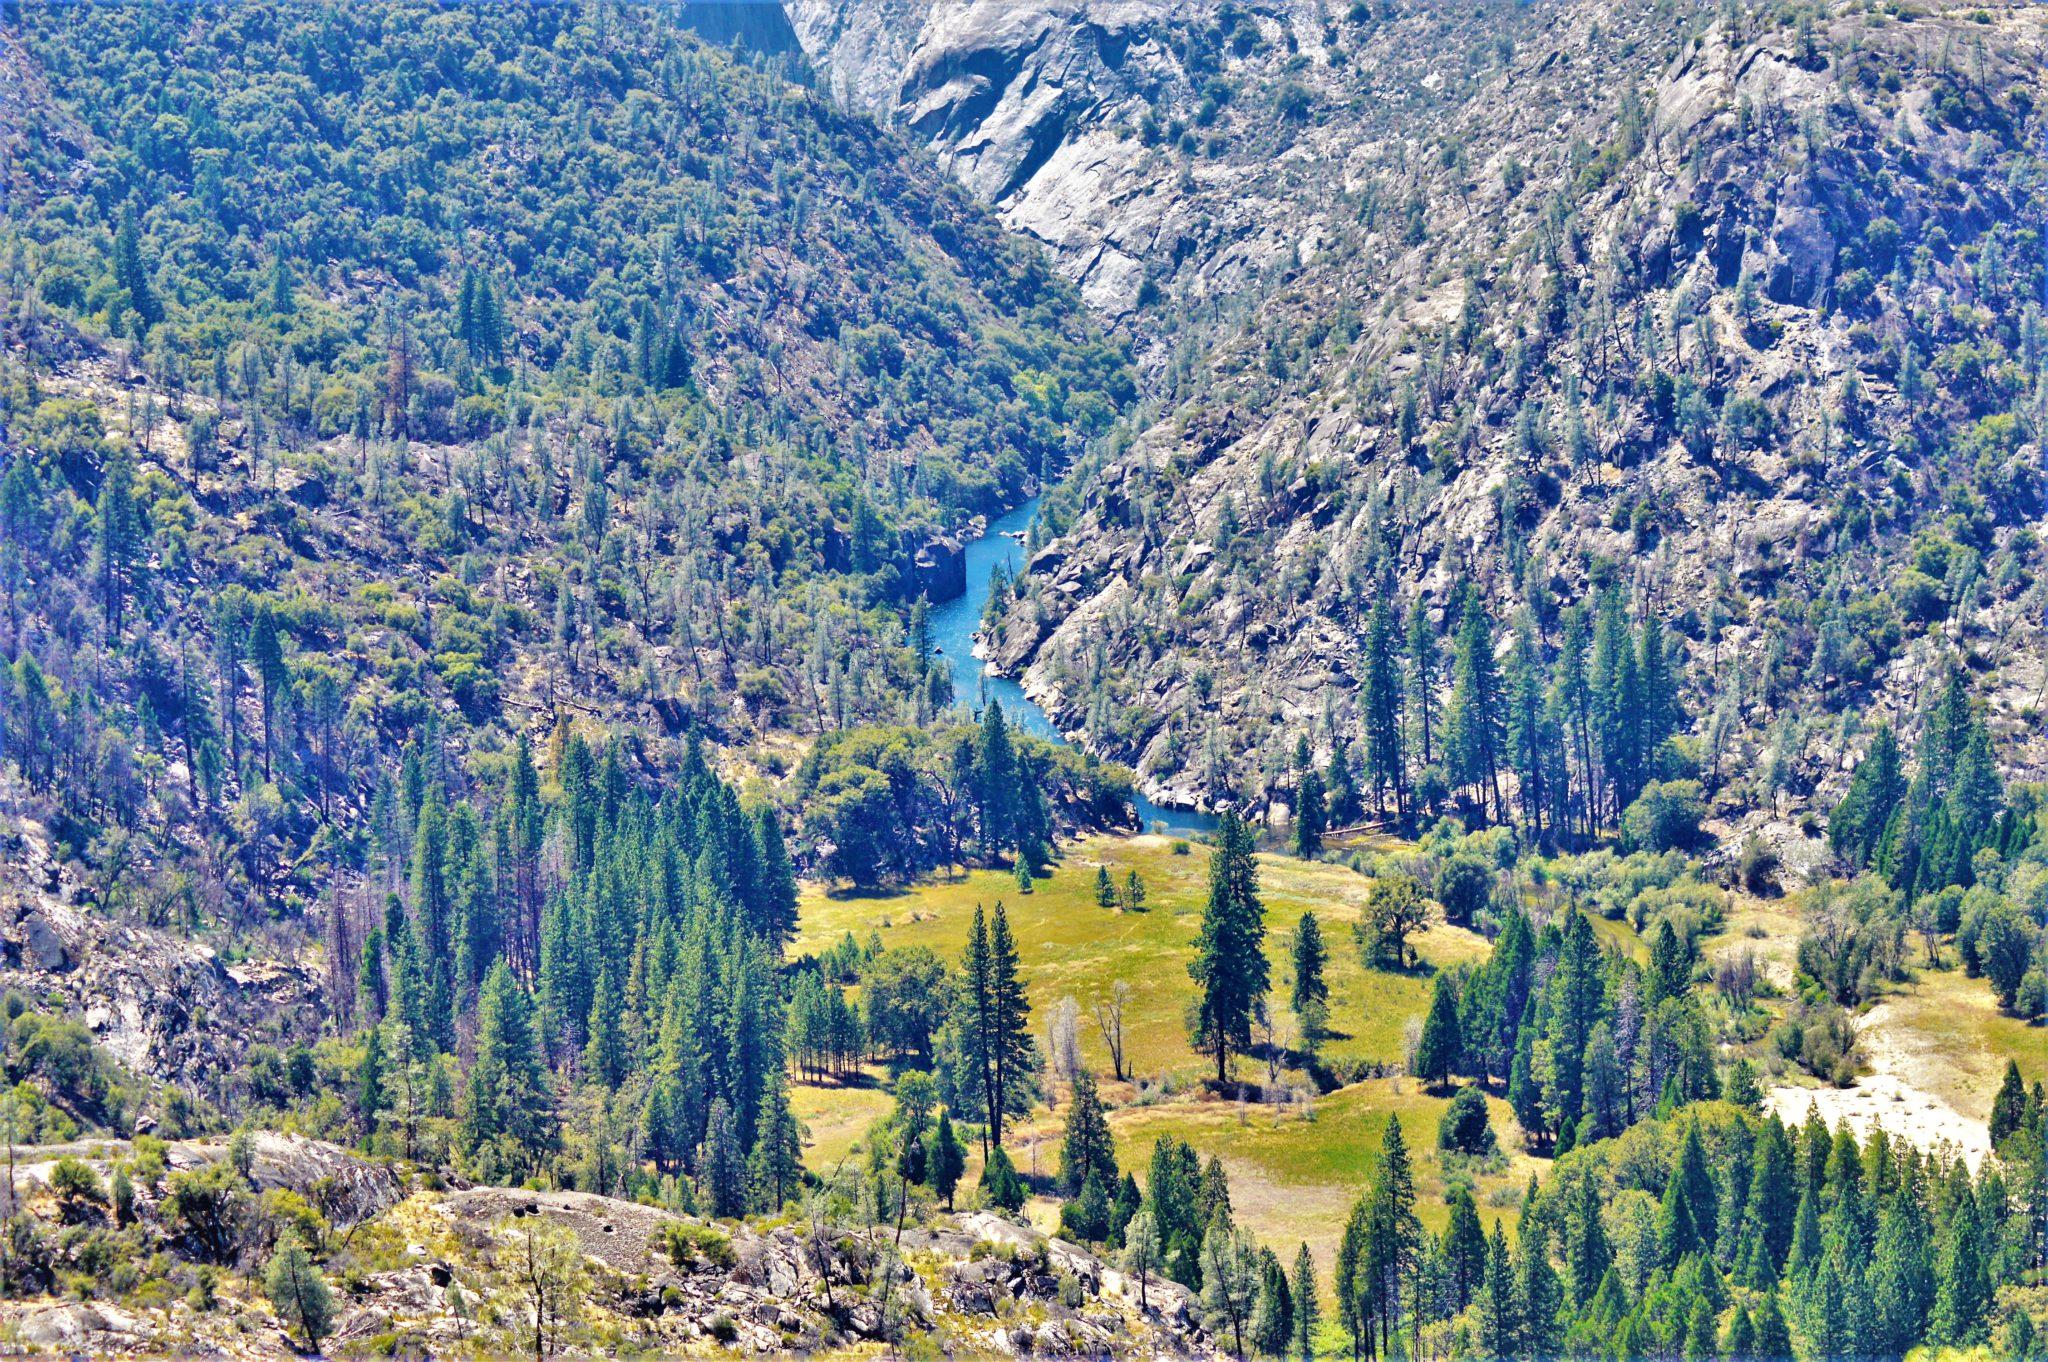 Scenery at Hetch Hetchy, California dam